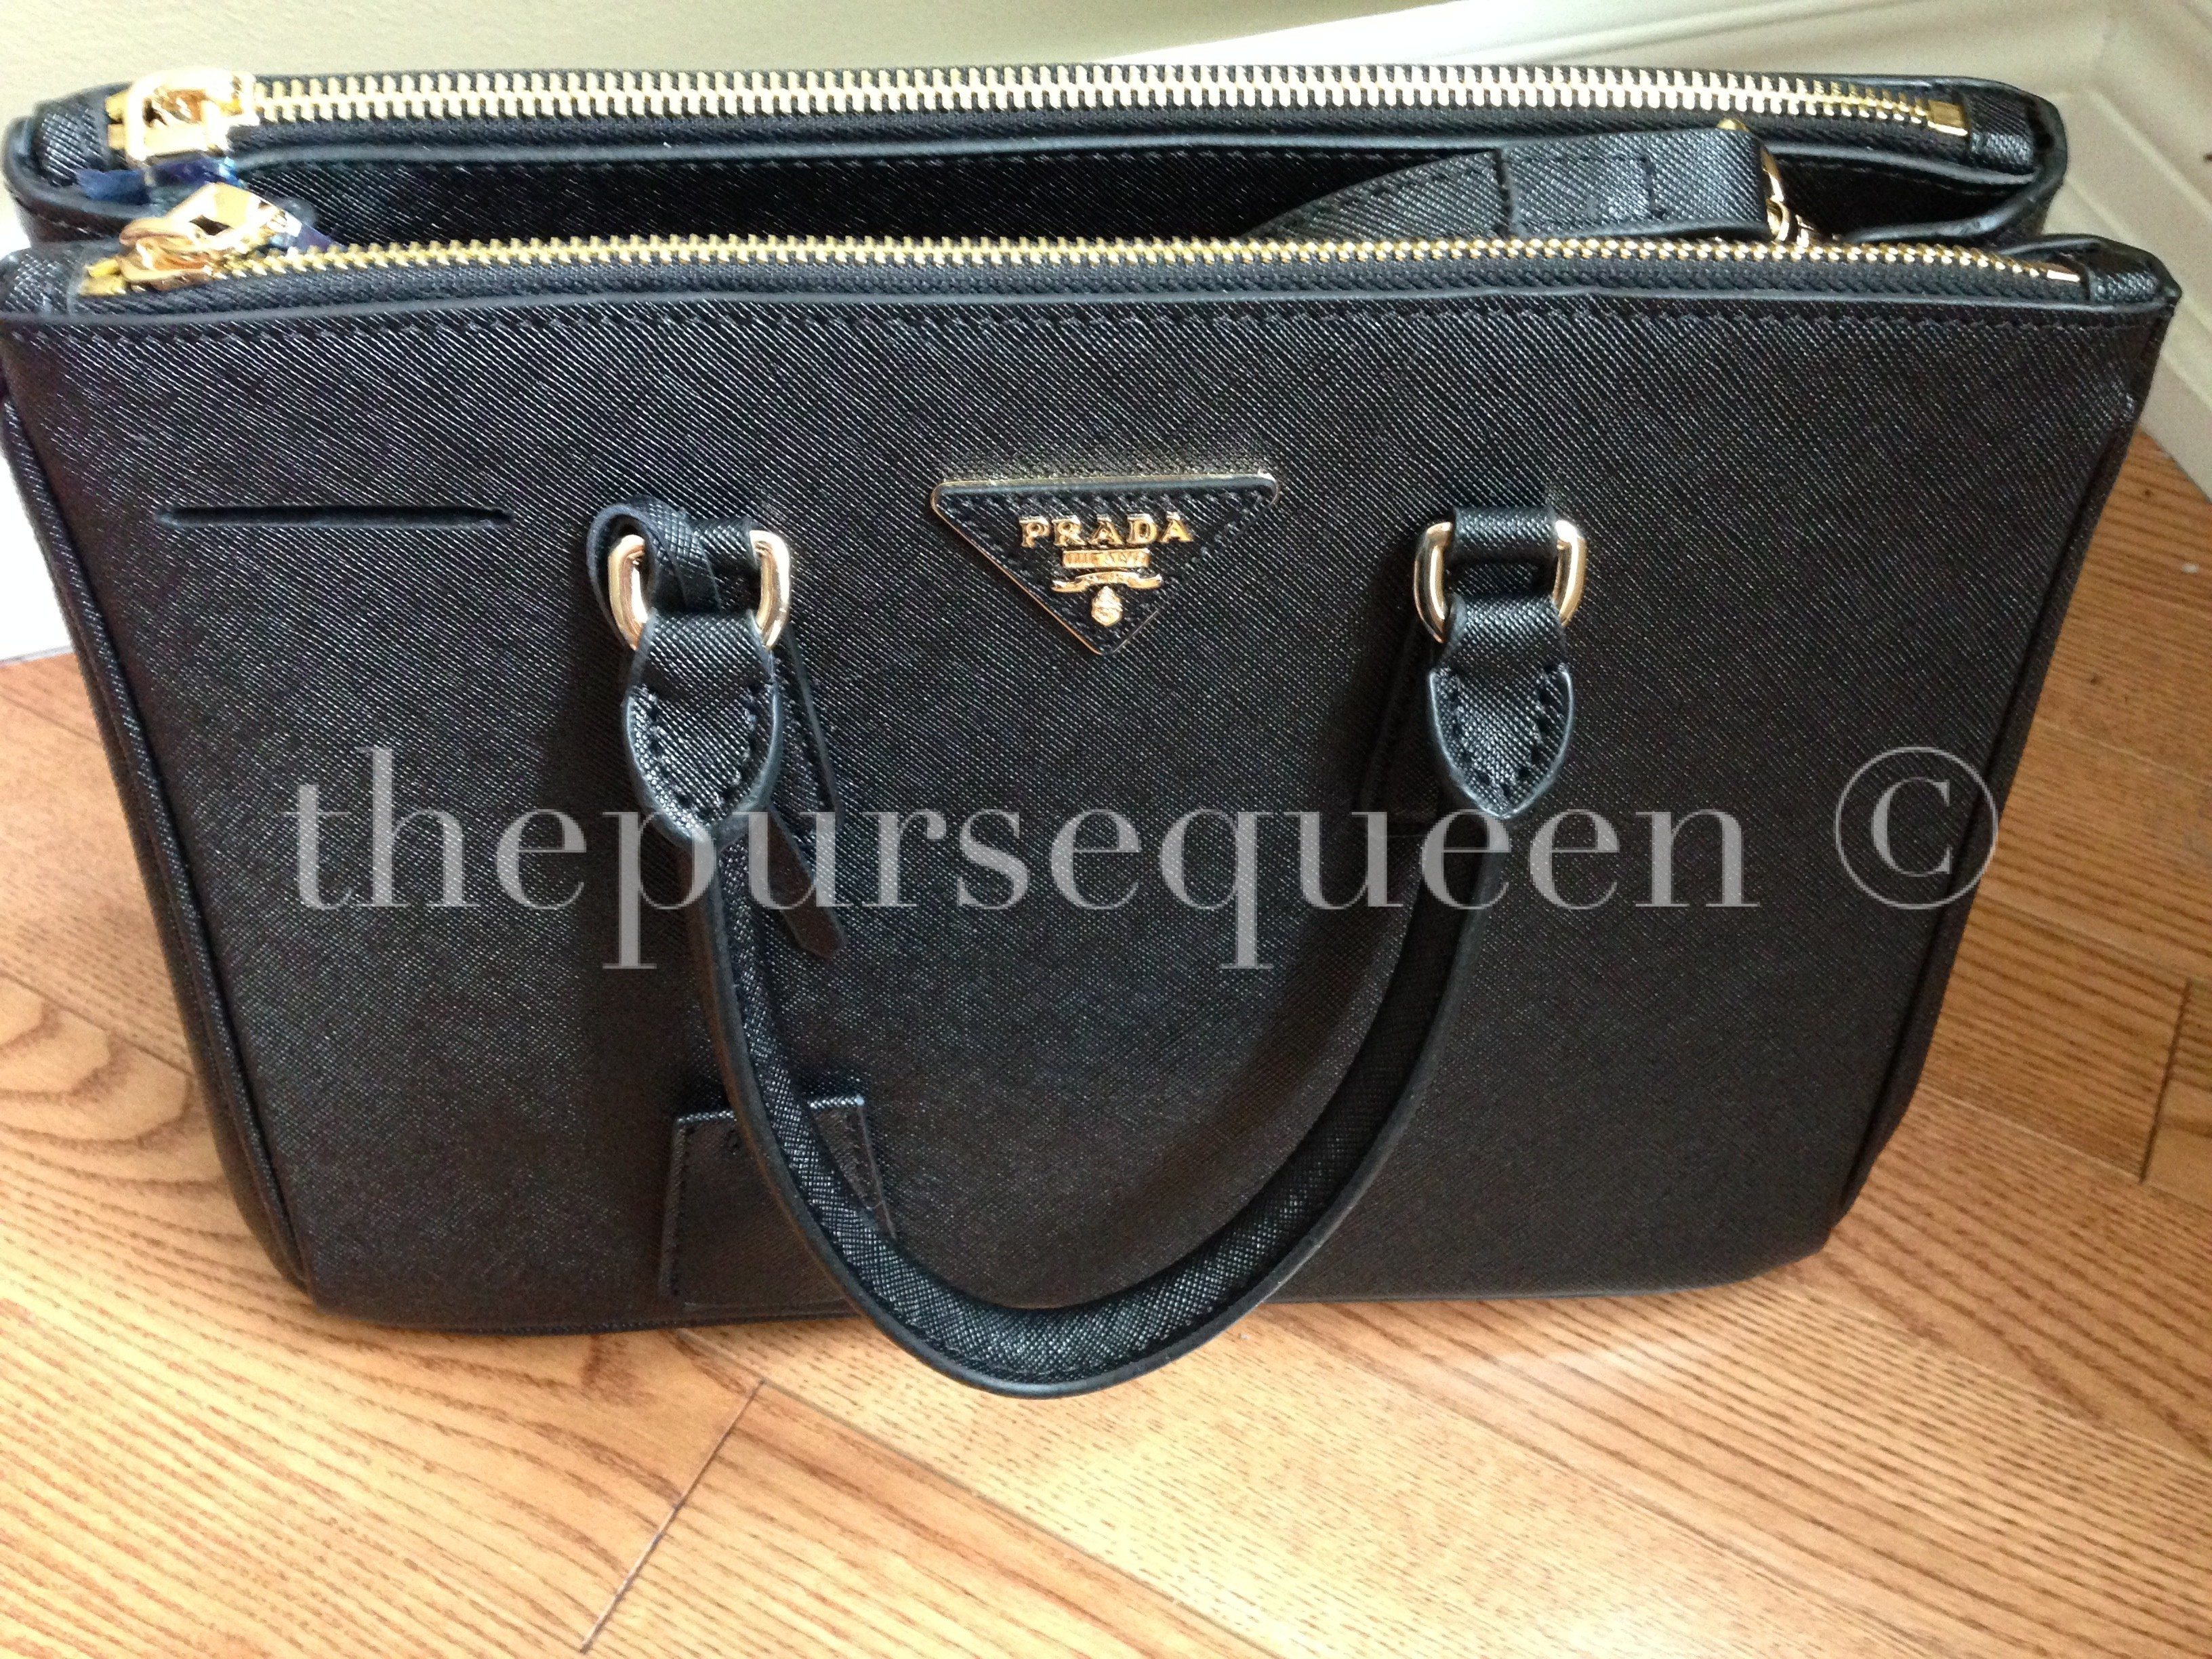 dece922d6311 Prada Archives - Authentic   Replica Handbag Reviews by The Purse Queen